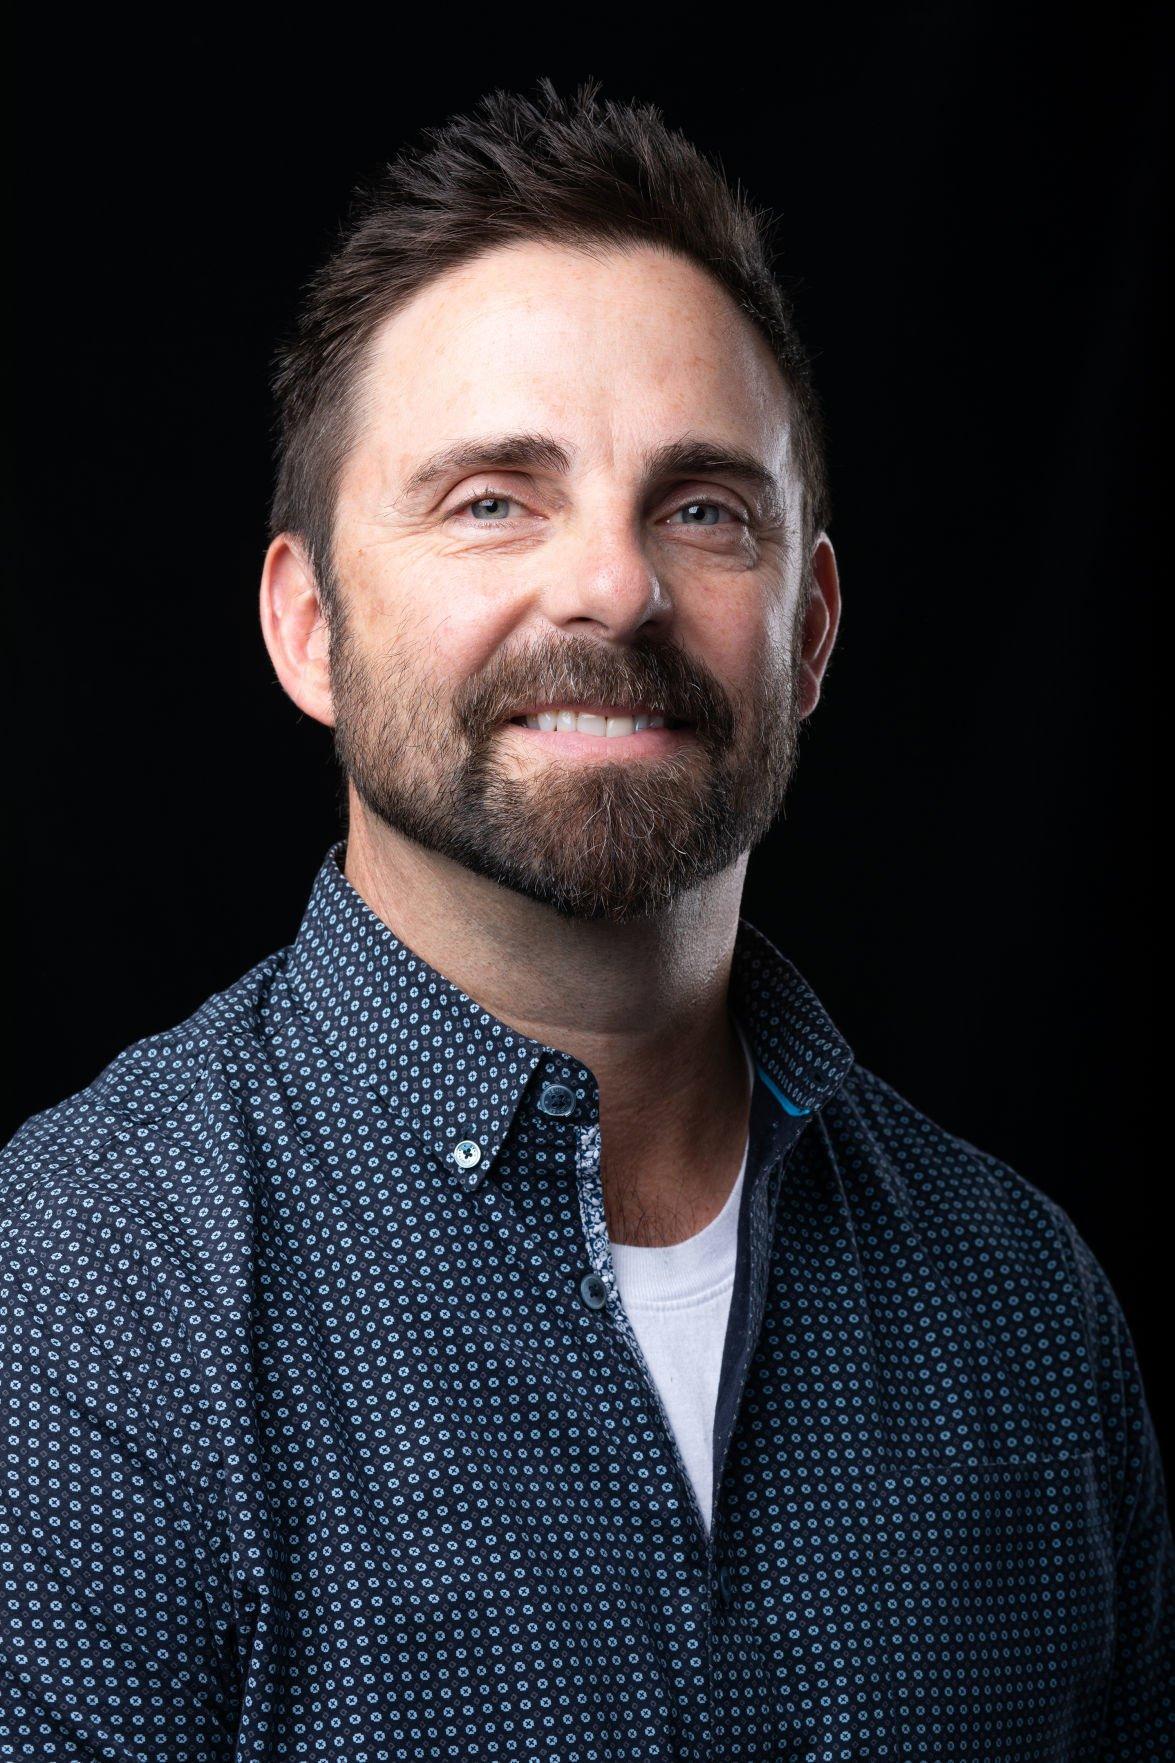 Kurt Michael